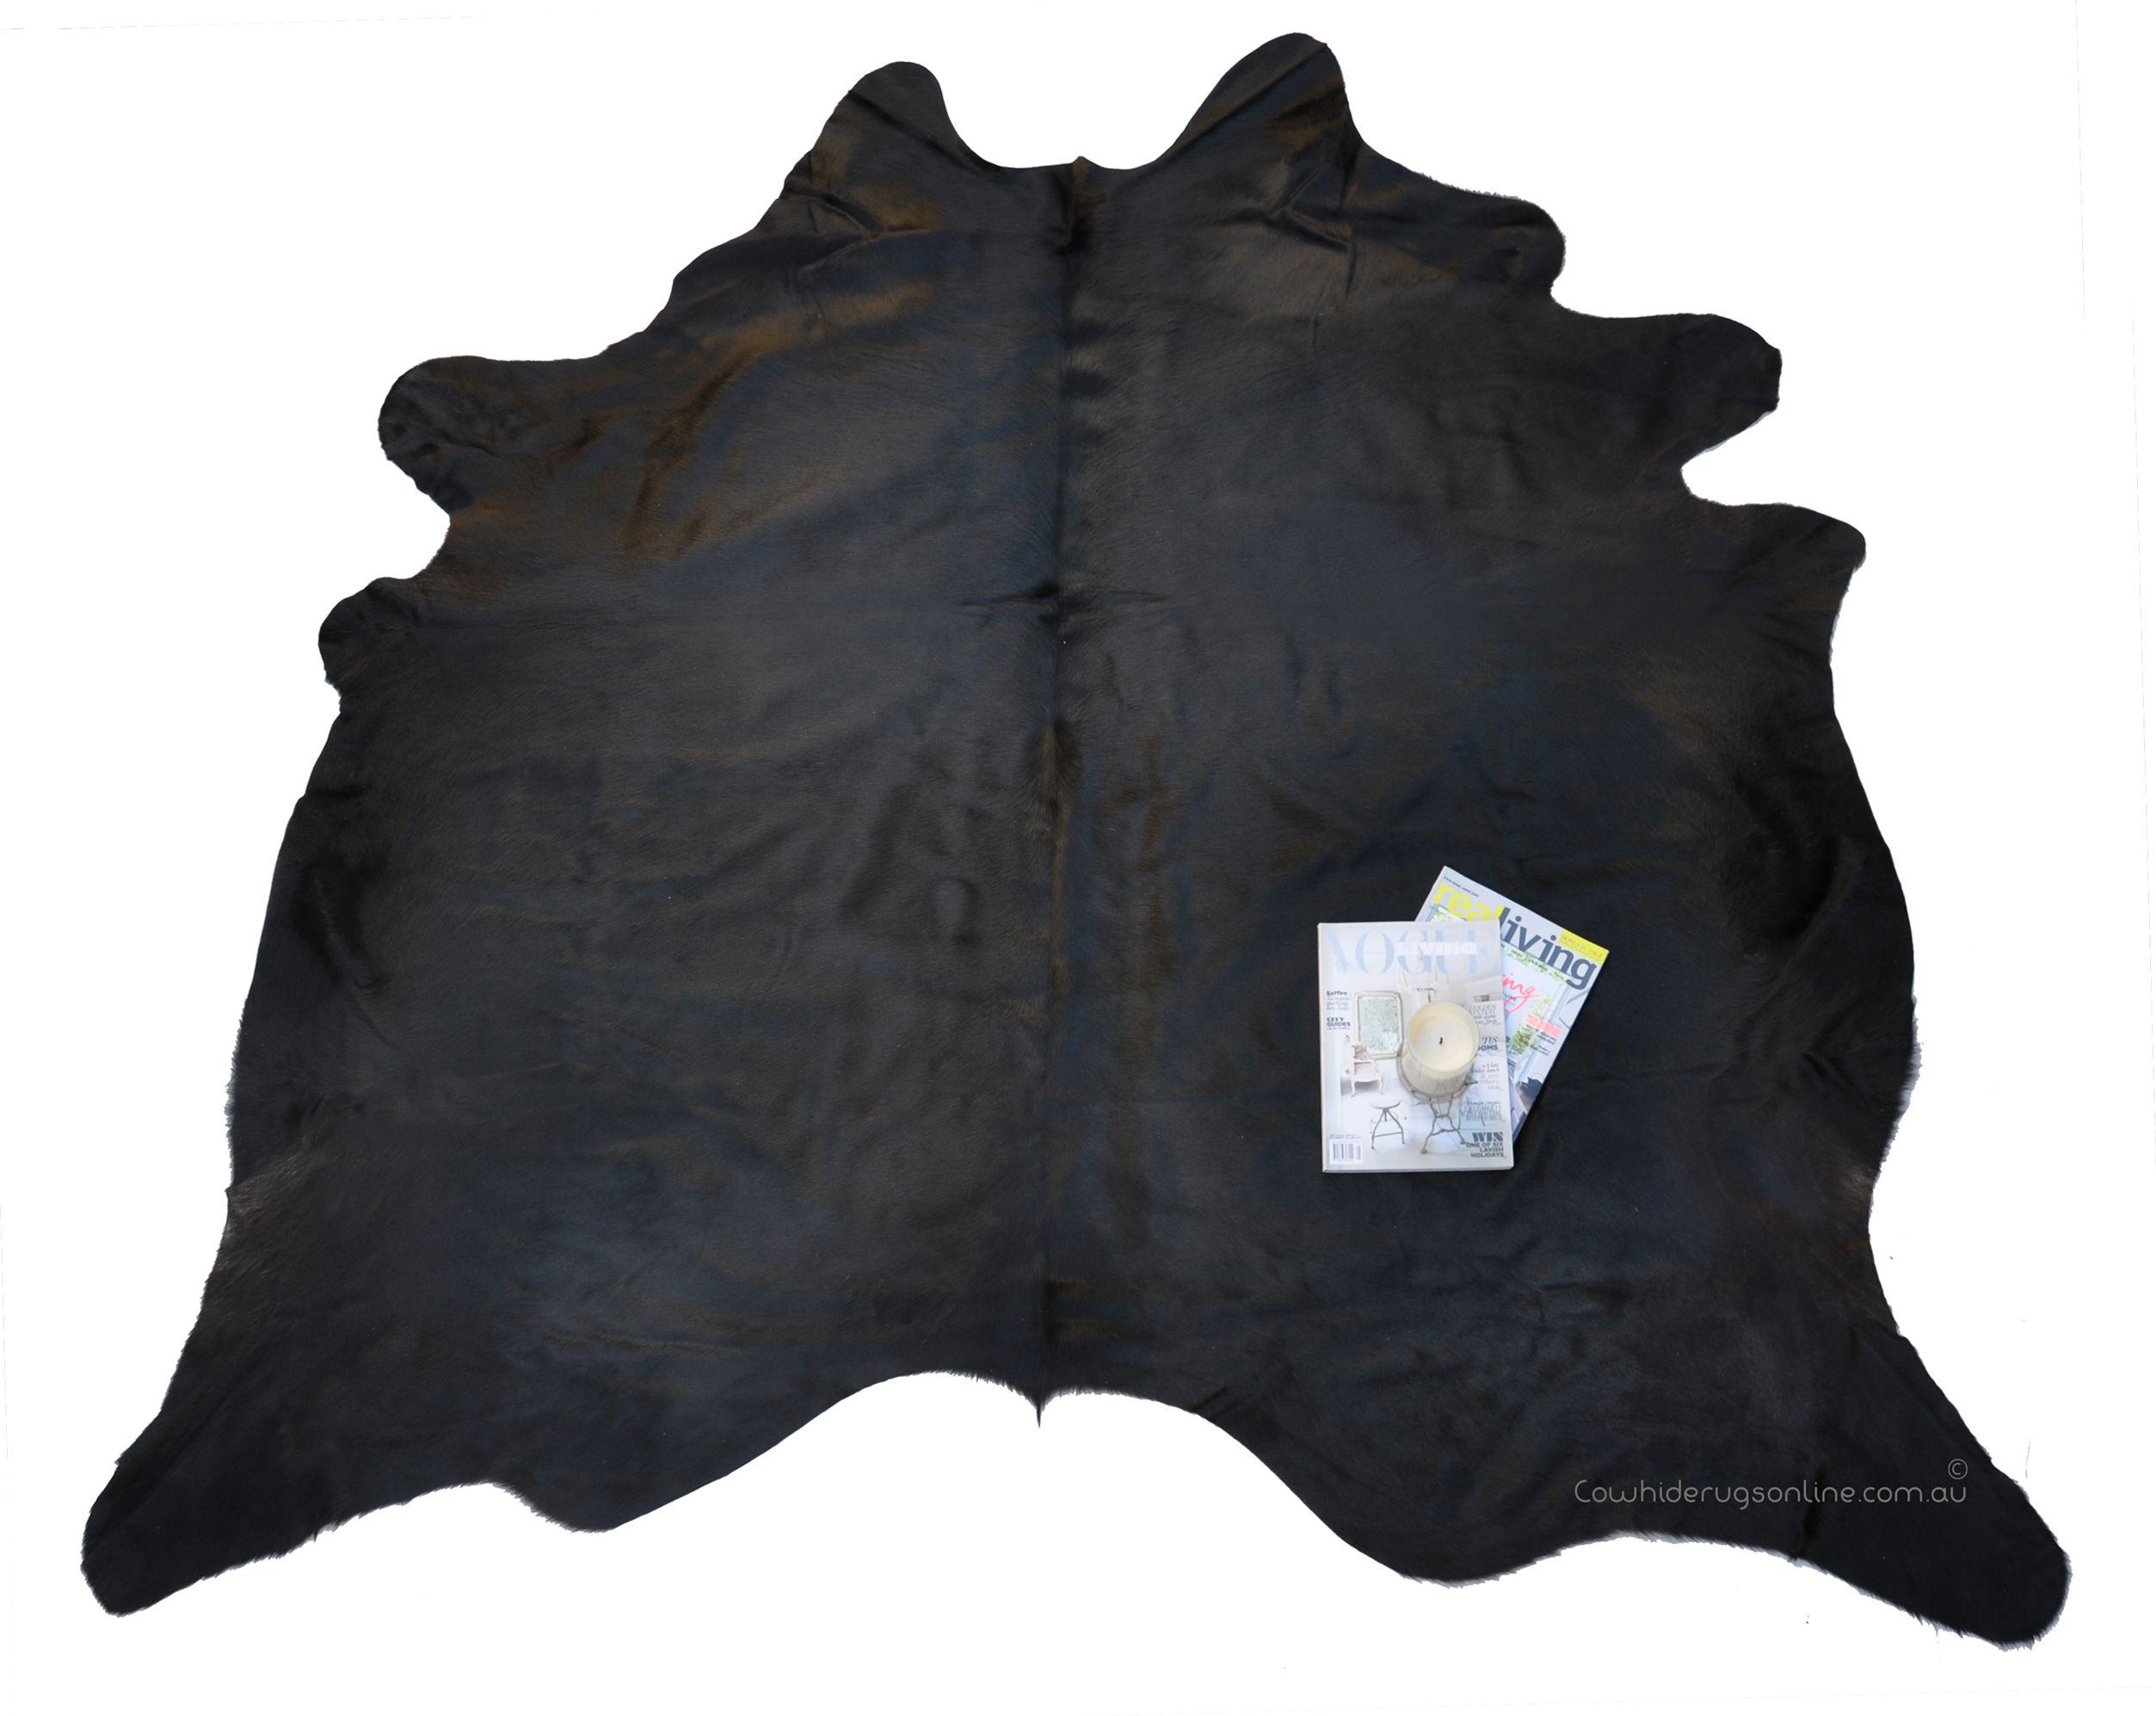 Black White Cowhide Leather Rug 349 Www Cowhiderugsonline Com Au Australia Wide Shipping Cow Hide Rug Natural Cowhide Black Cowhide Rug